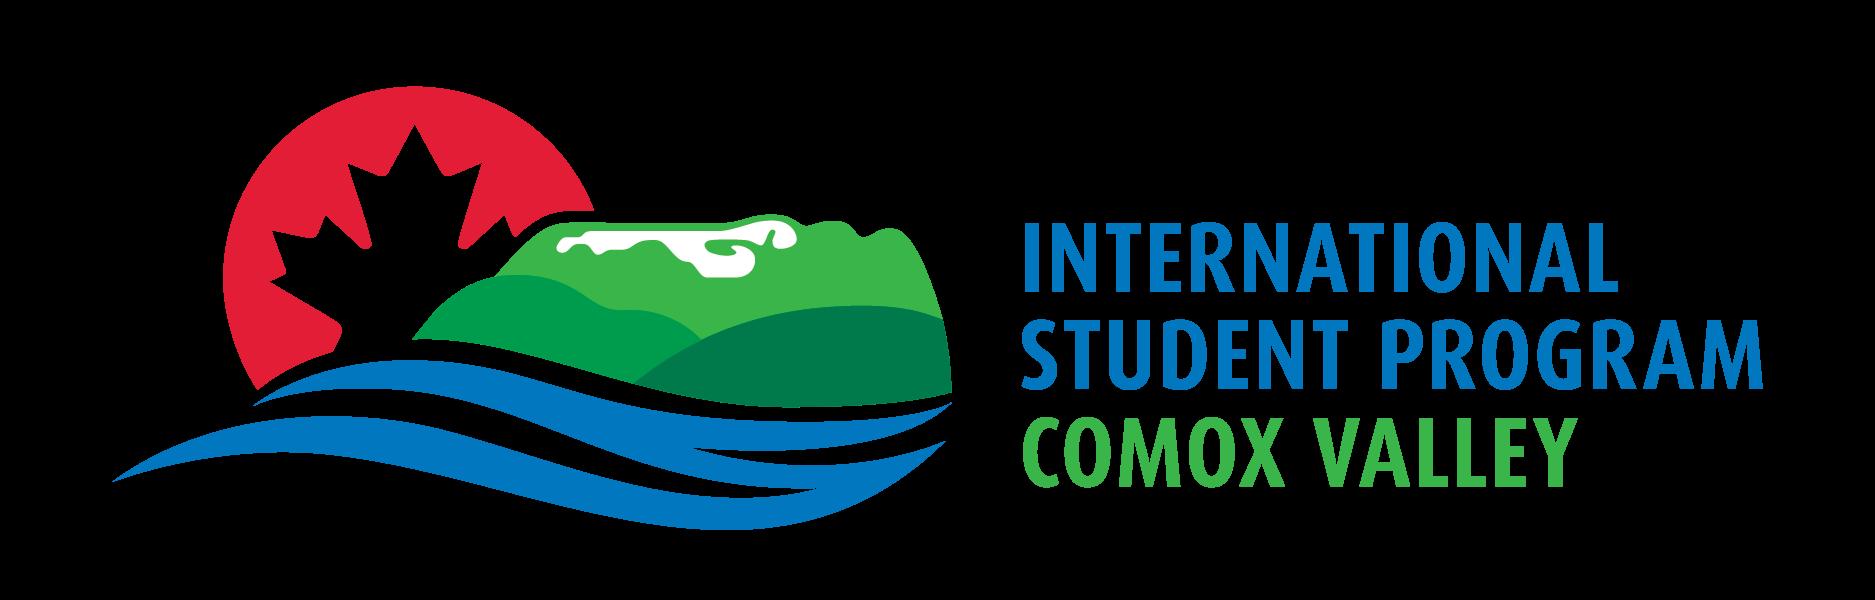 Comox Valley International Student Program.